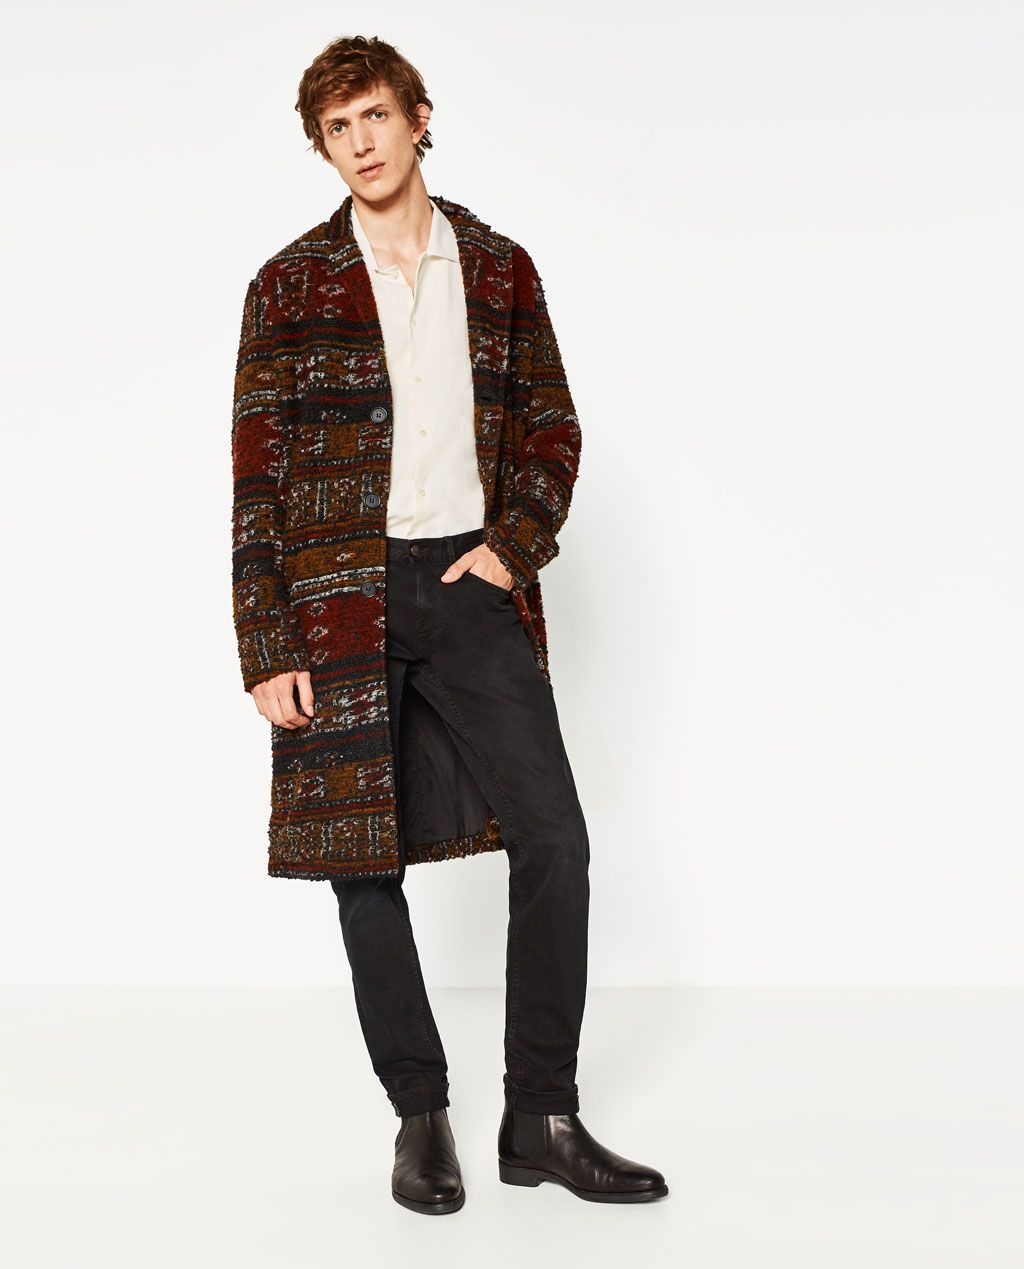 Boucle Coat Outerwear Man Zara United States Modestil Mantel